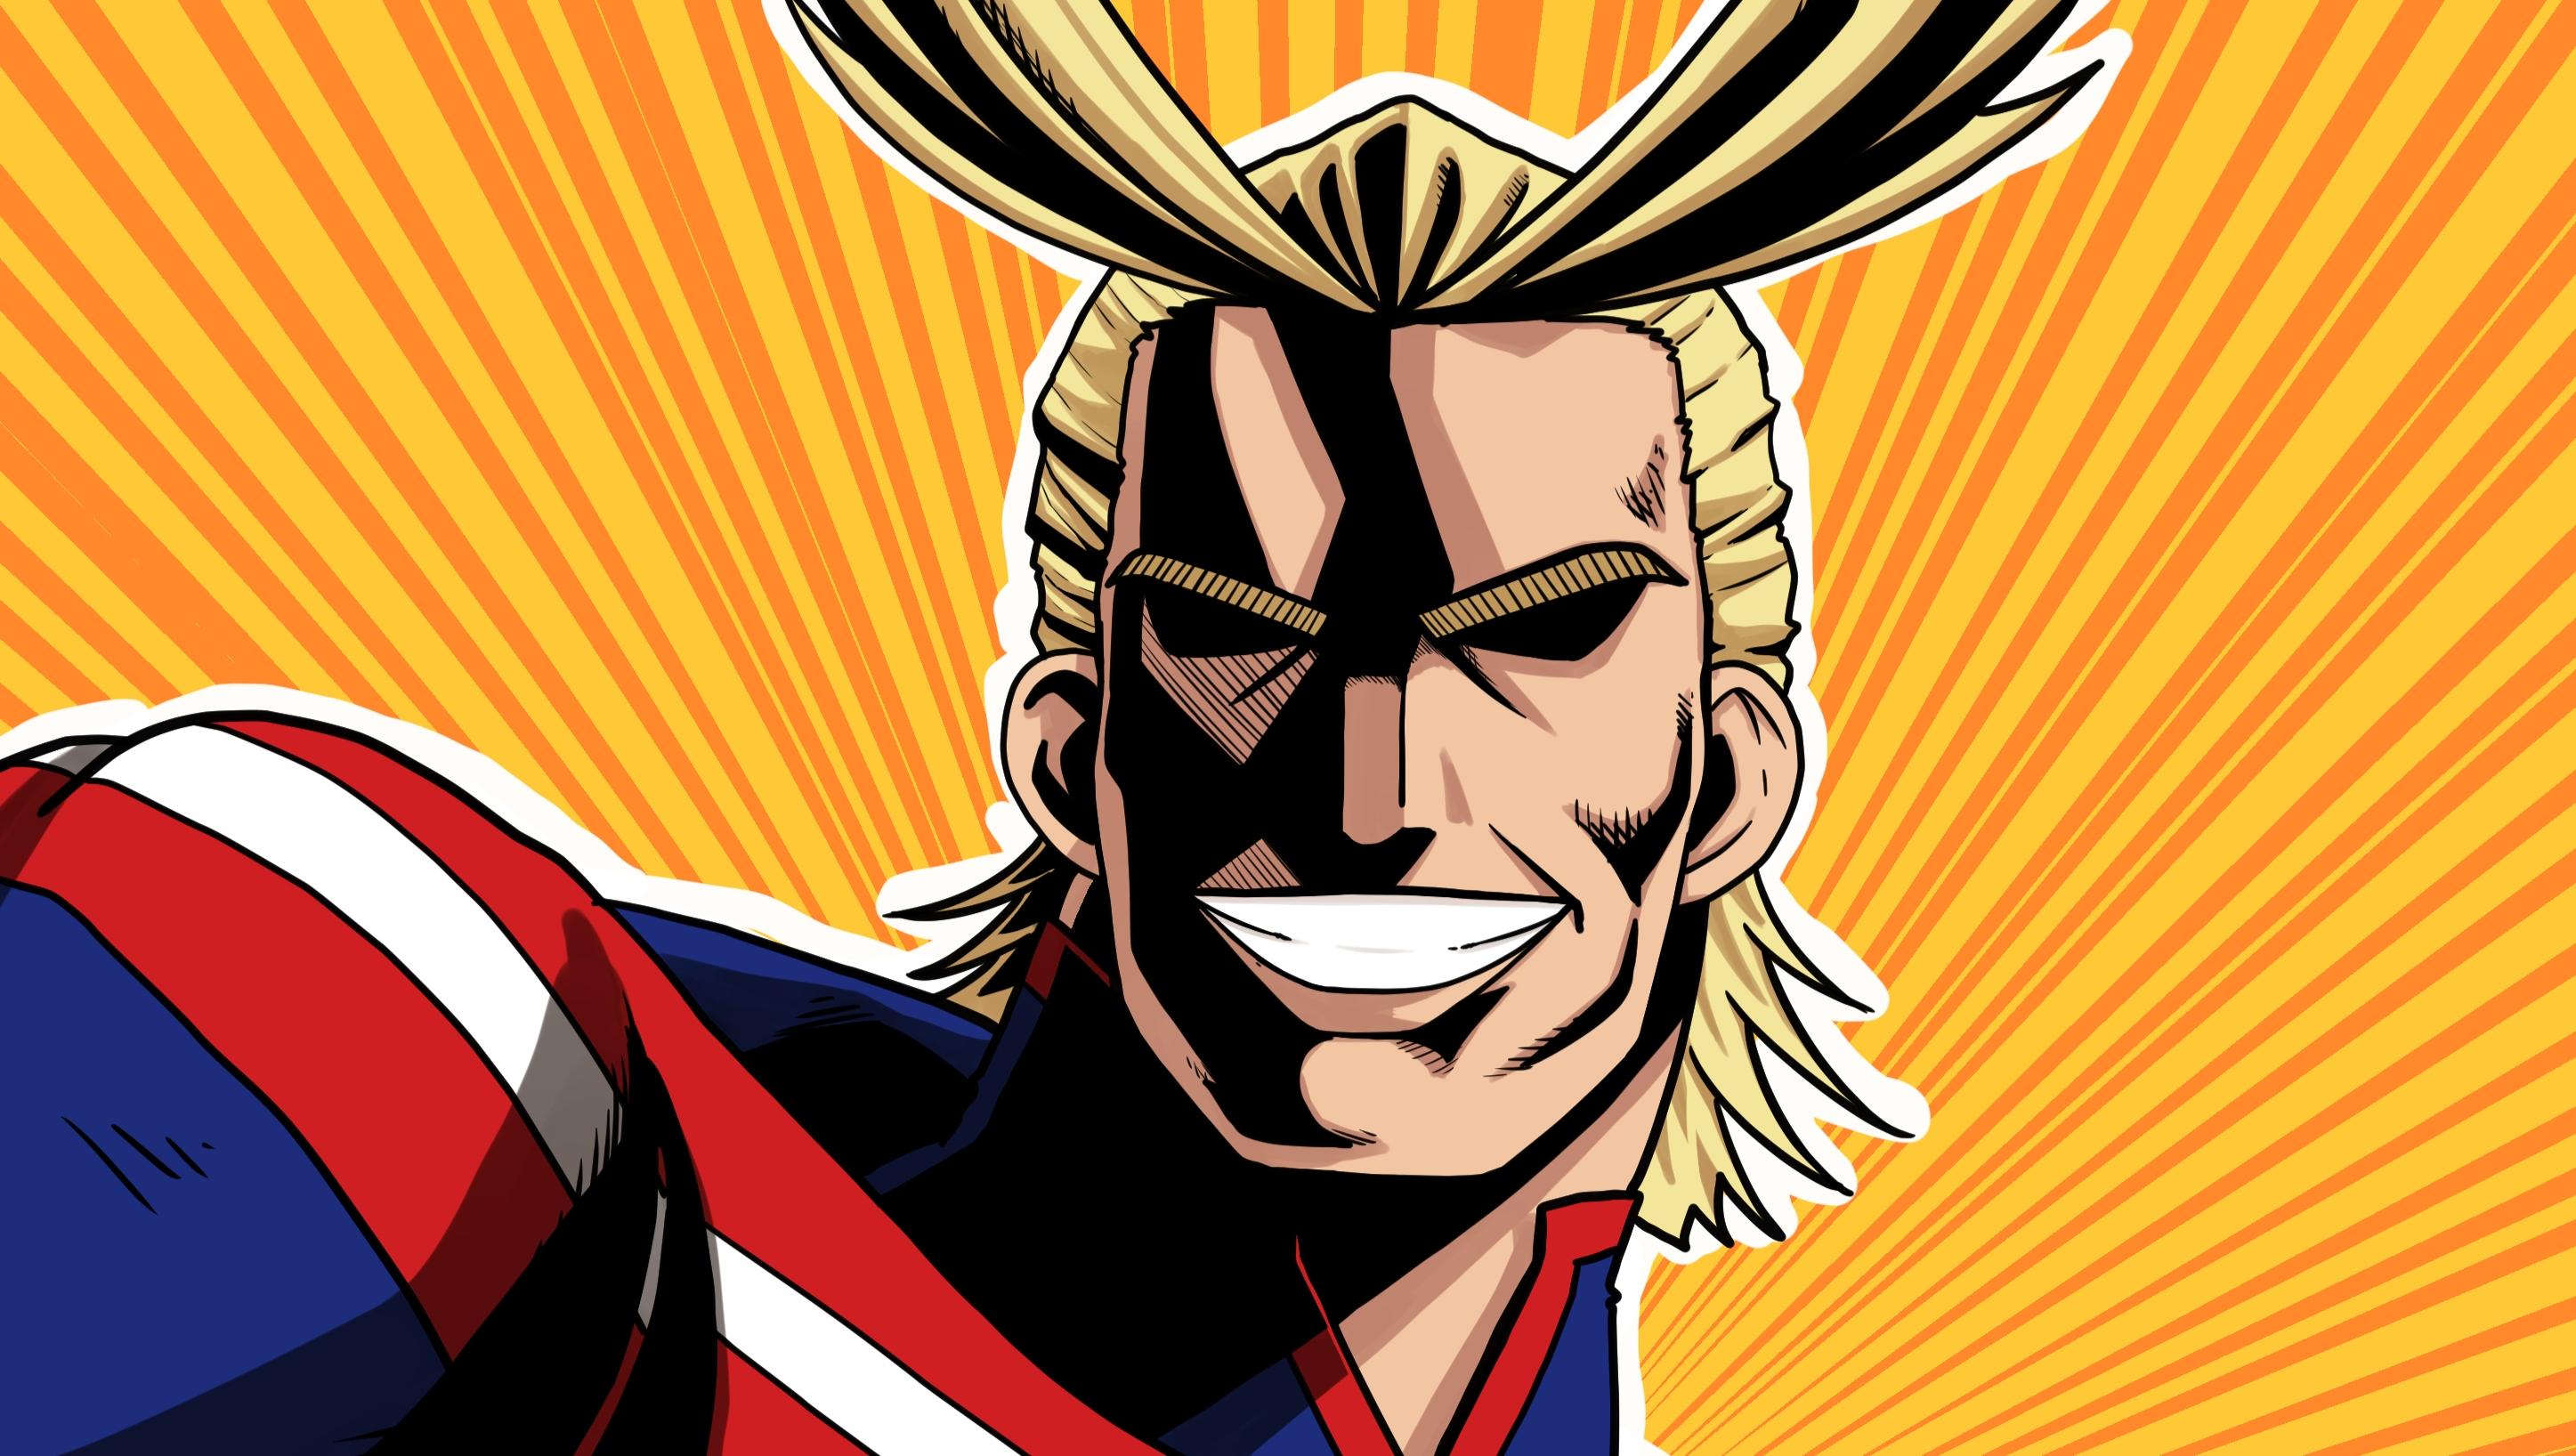 Wallpaper Anime Boku No Hero Boku No Hero Academia All Might